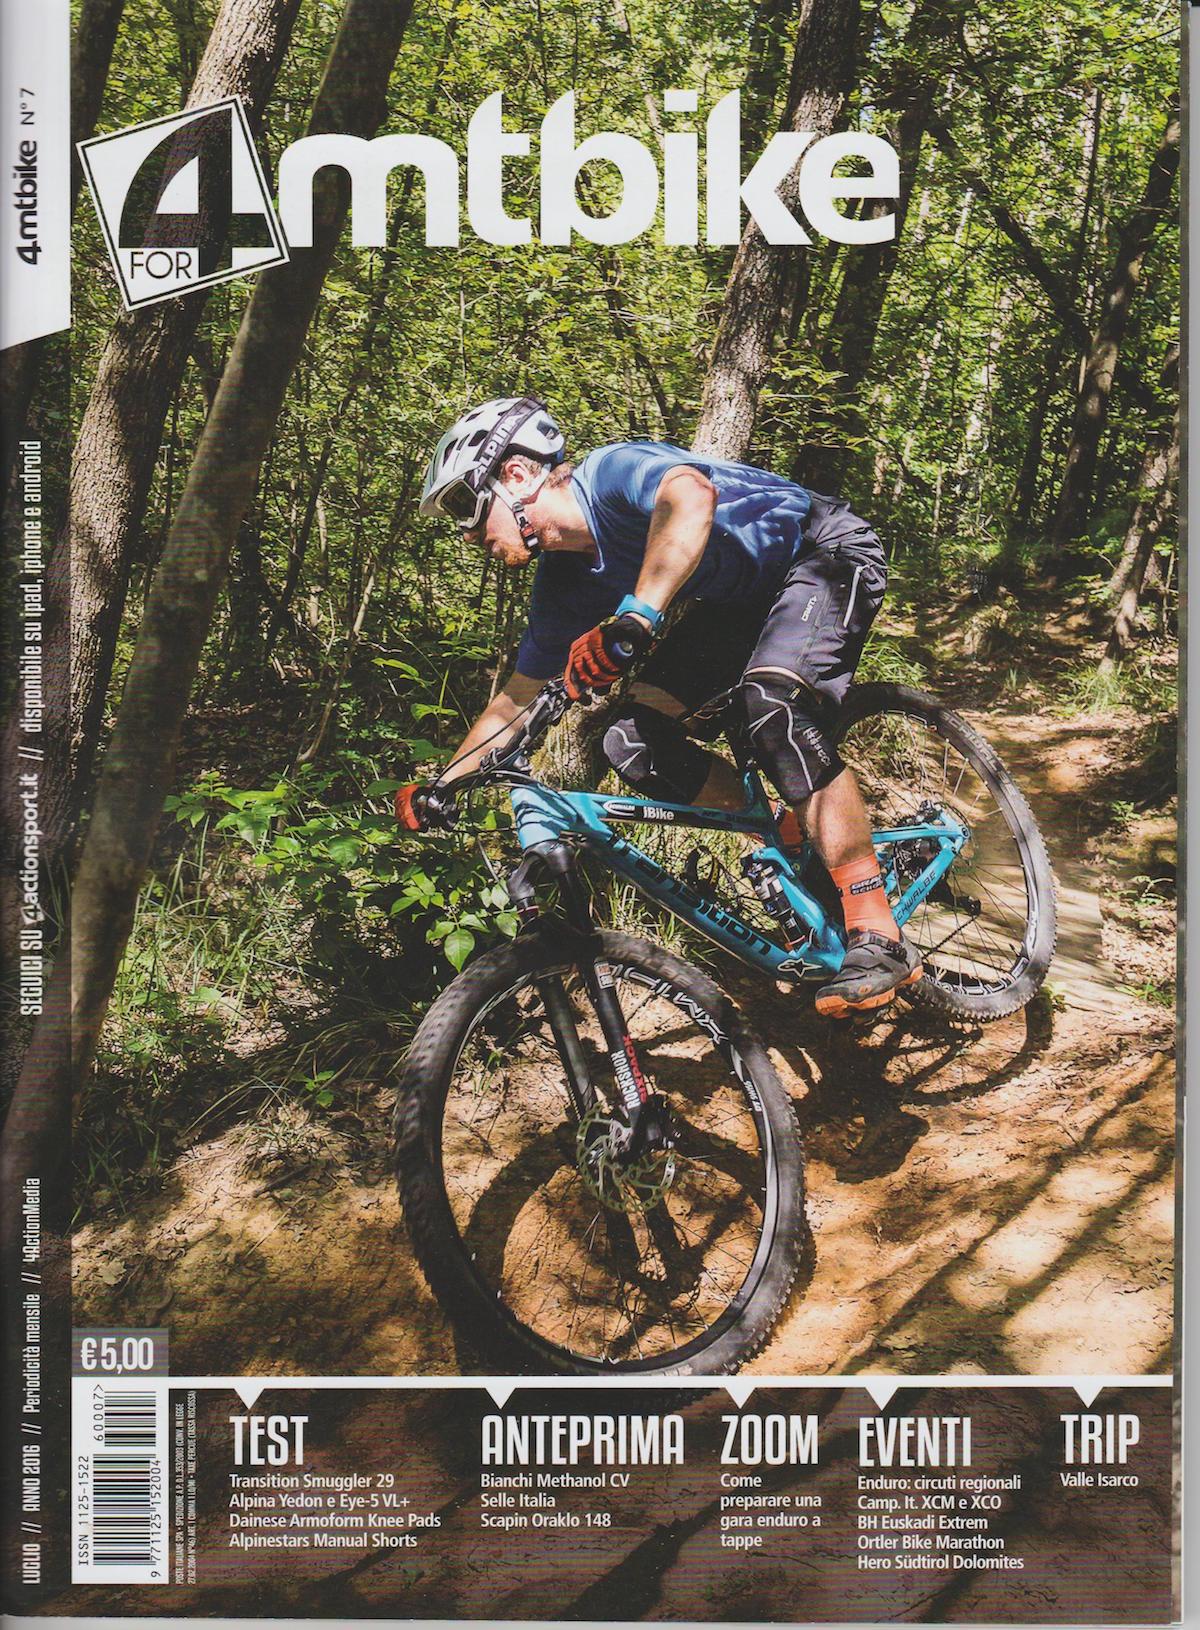 copertina 4mtbike luglio 2016 001